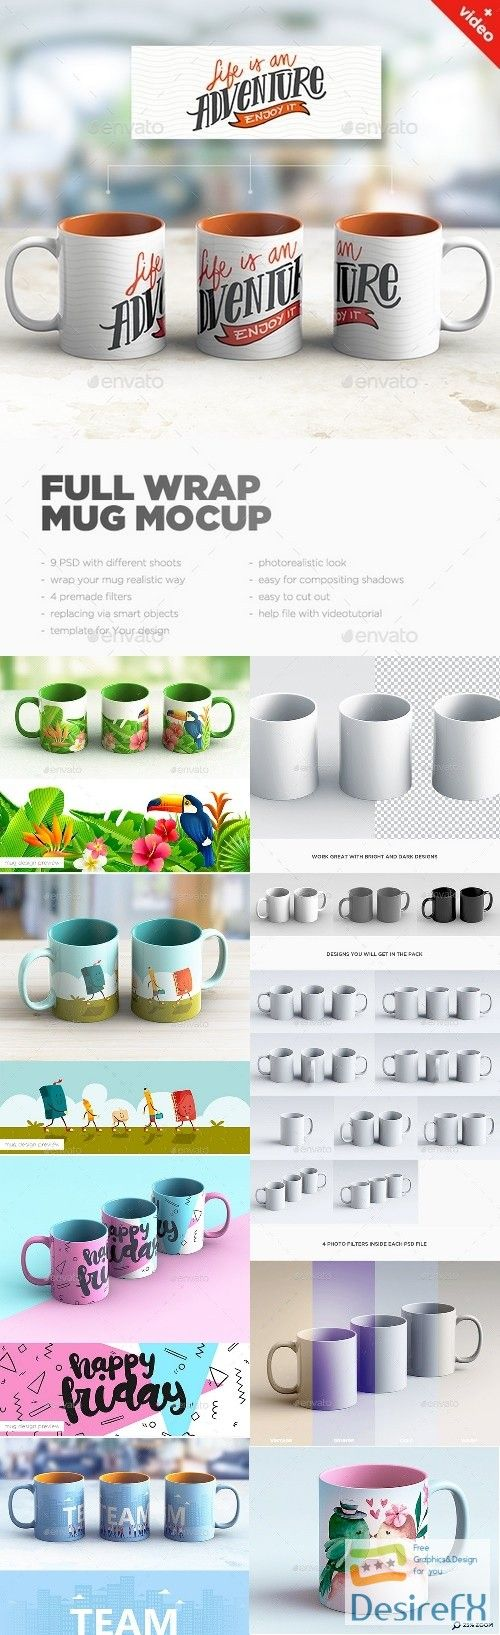 Download Full Wrap Mug Mockup 21642291 Desirefx Com Mugs Mockup Photoshop Projects